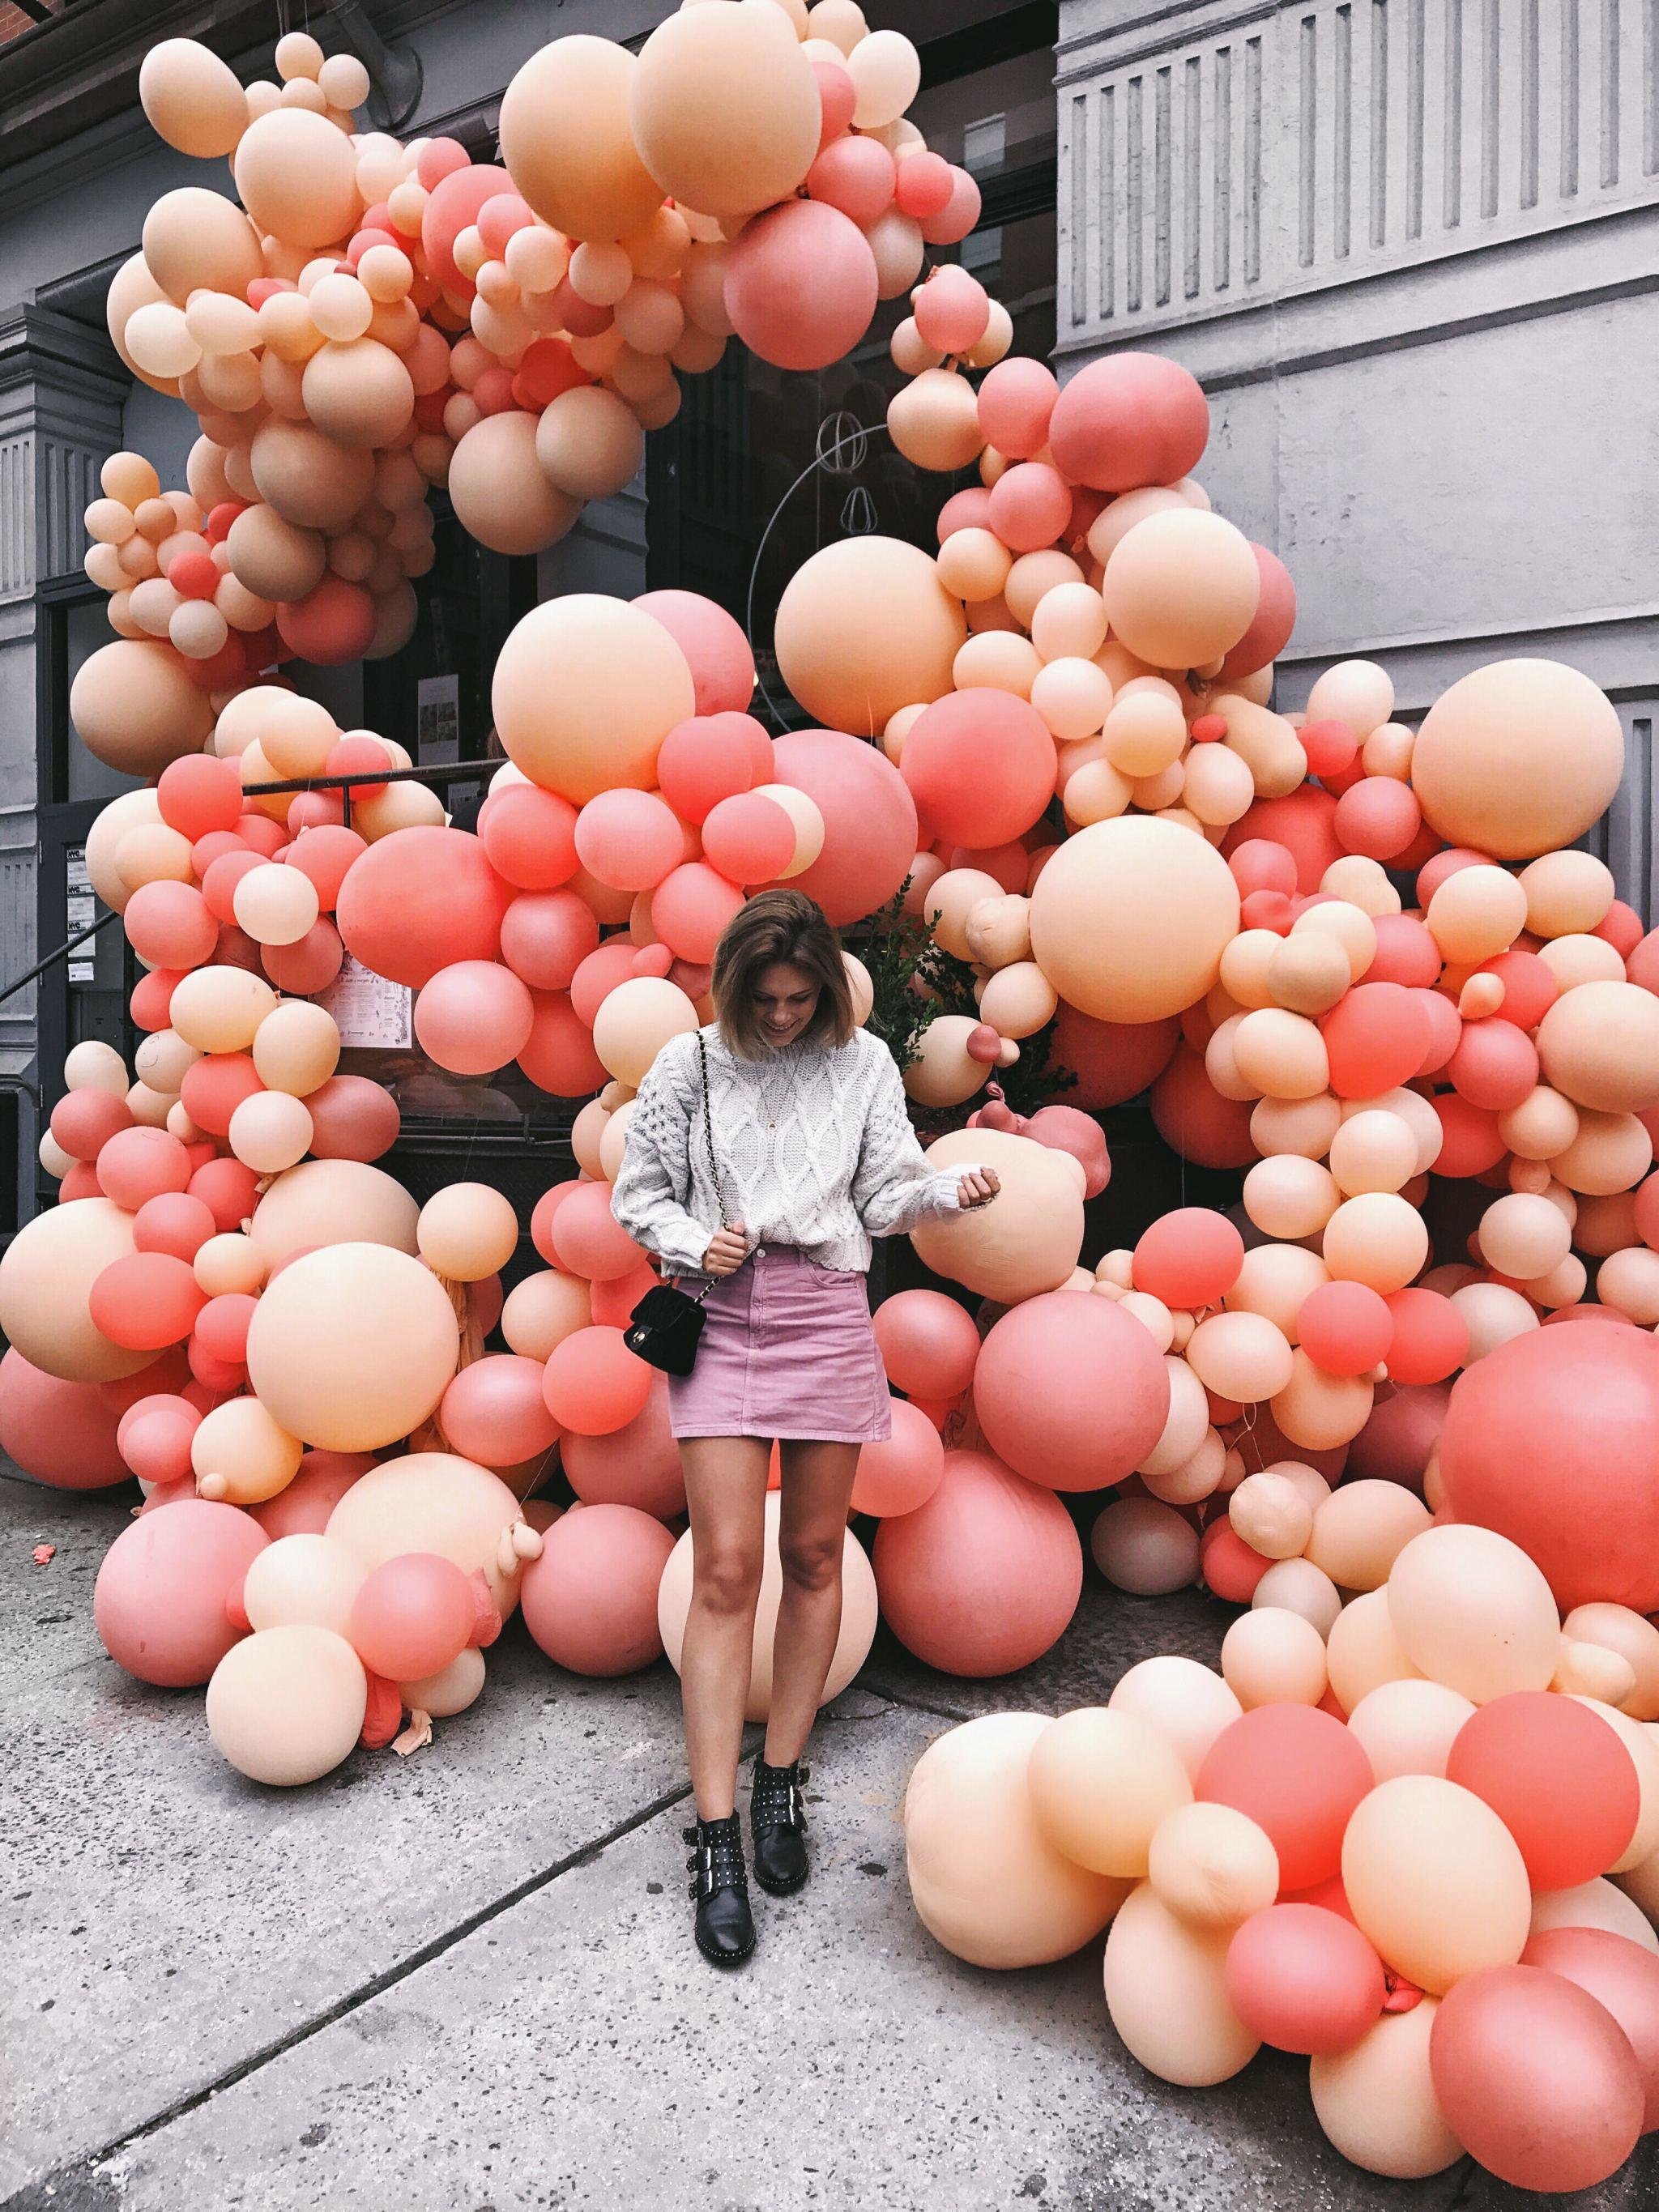 New york cocoa chelsea jesschamilton balloons